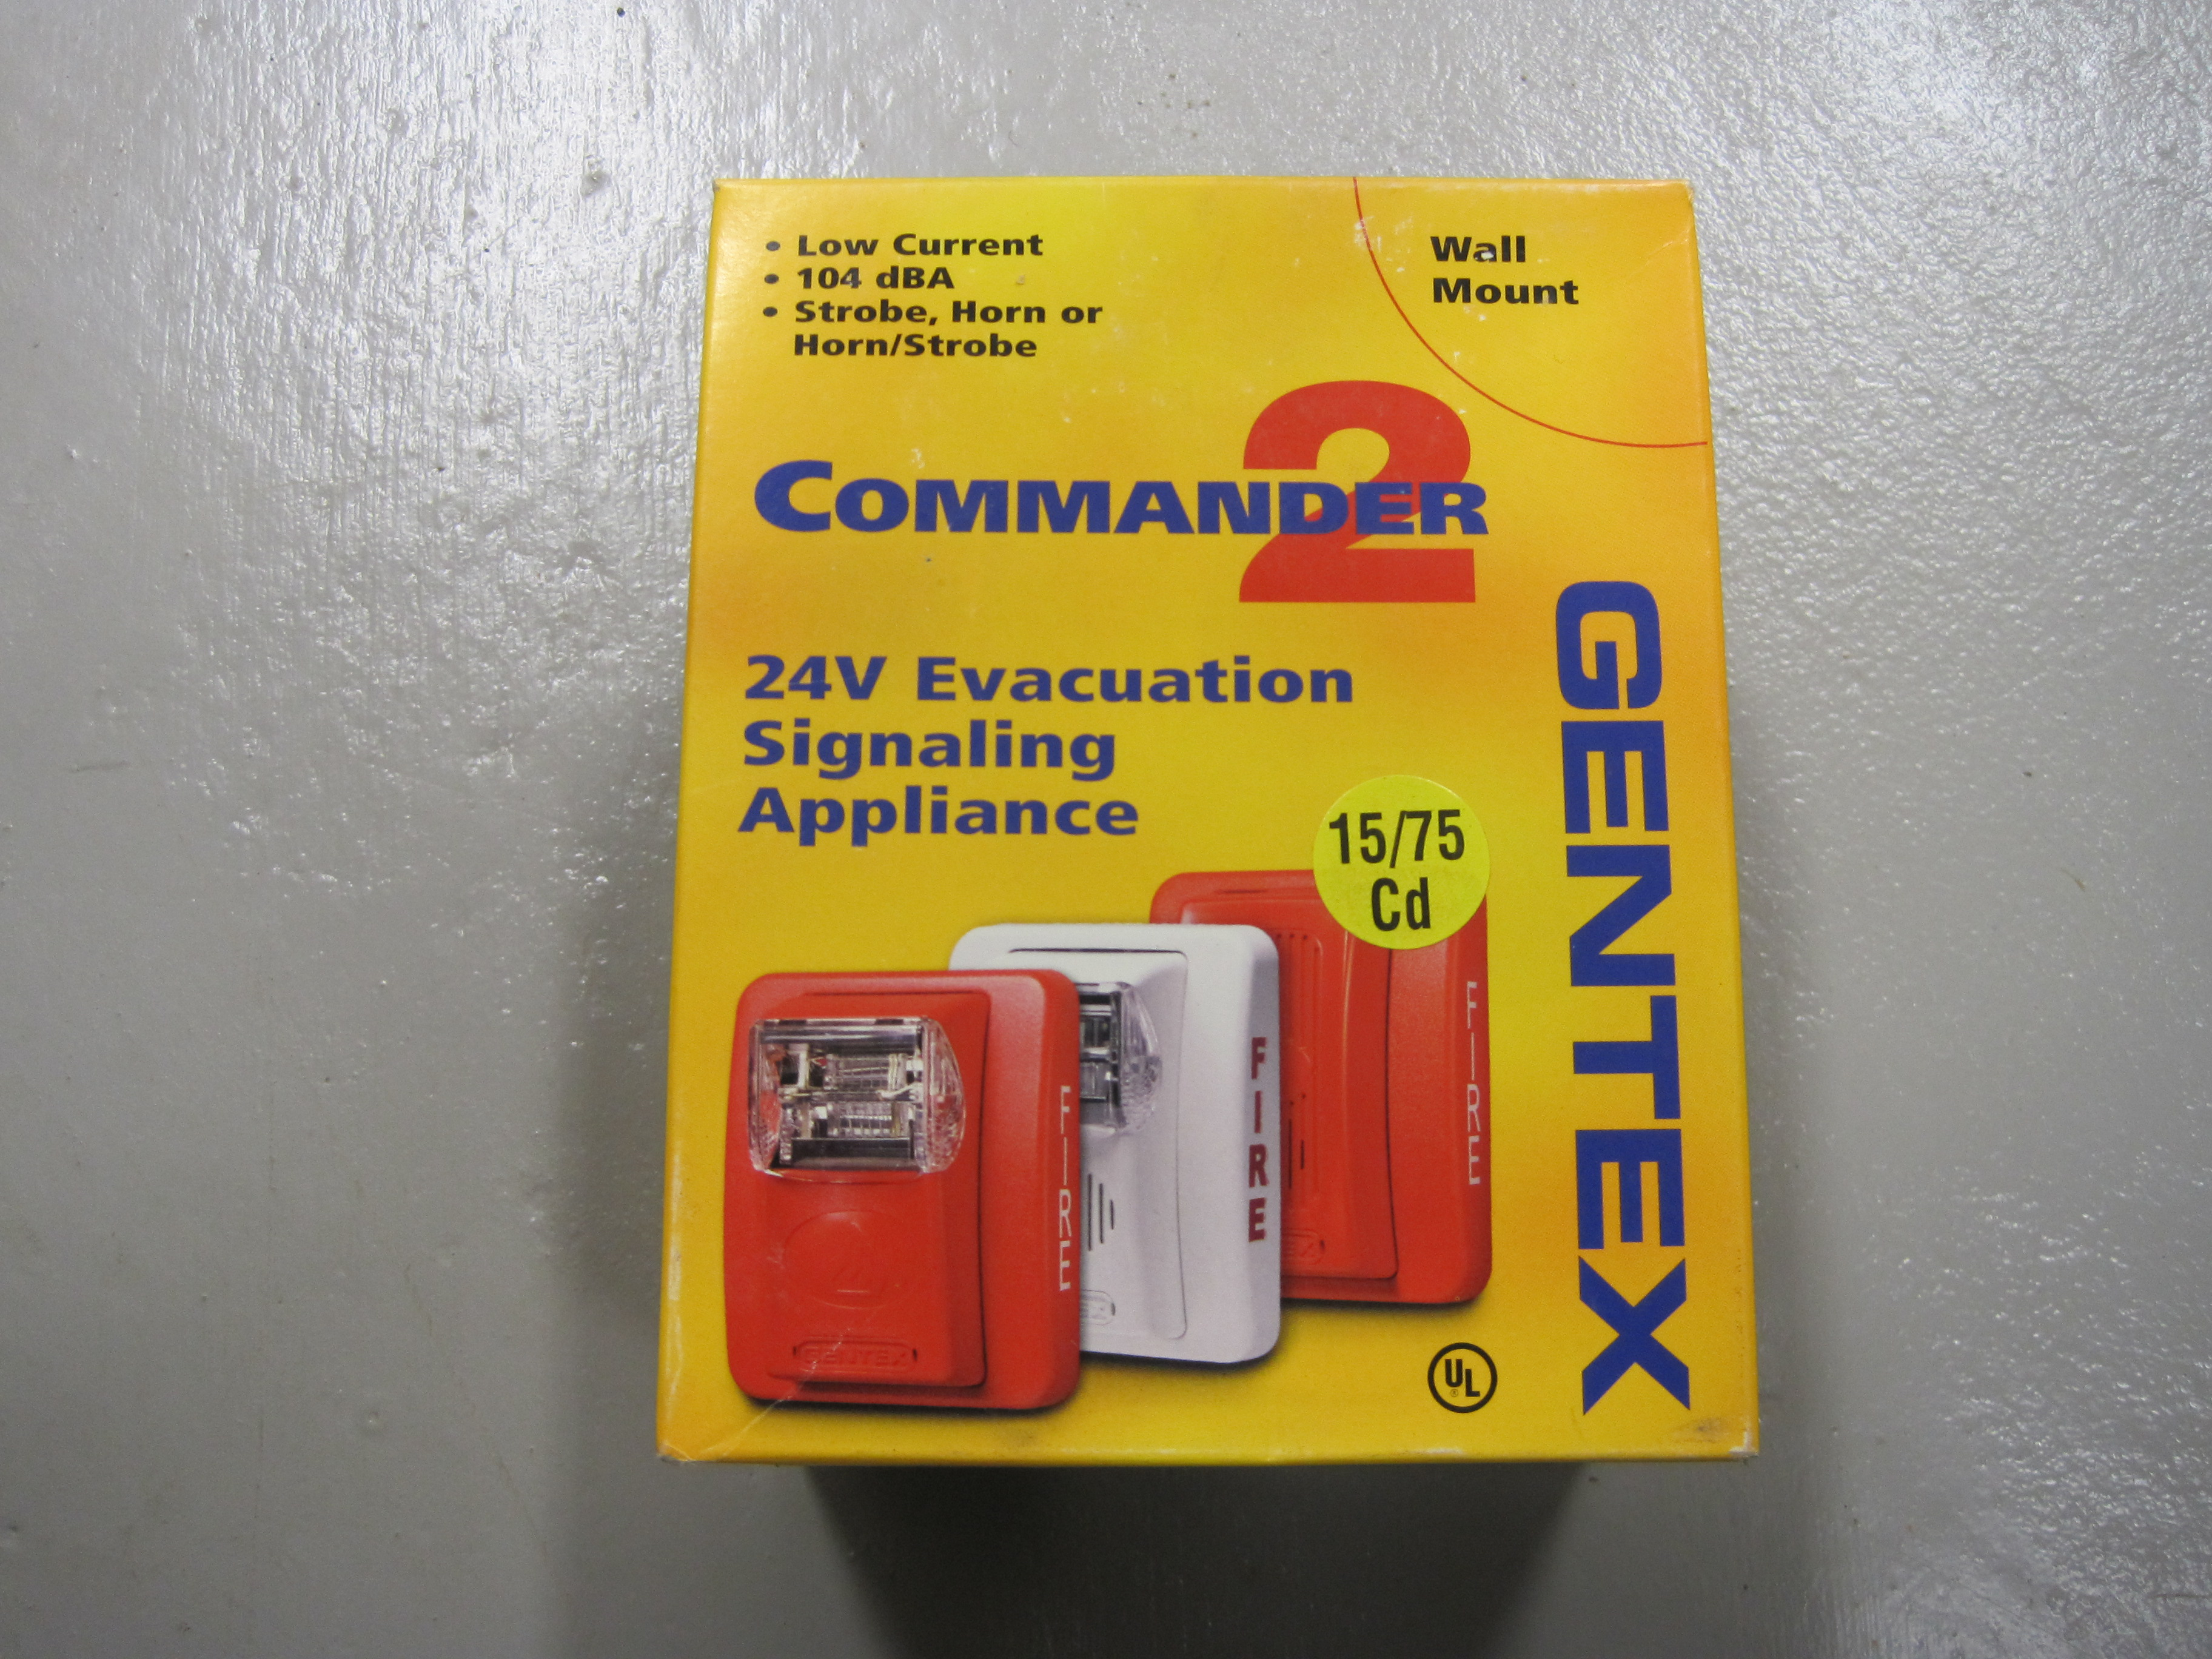 118a gentex commander 2 series fire alarm ges24 15 75pww $50 00